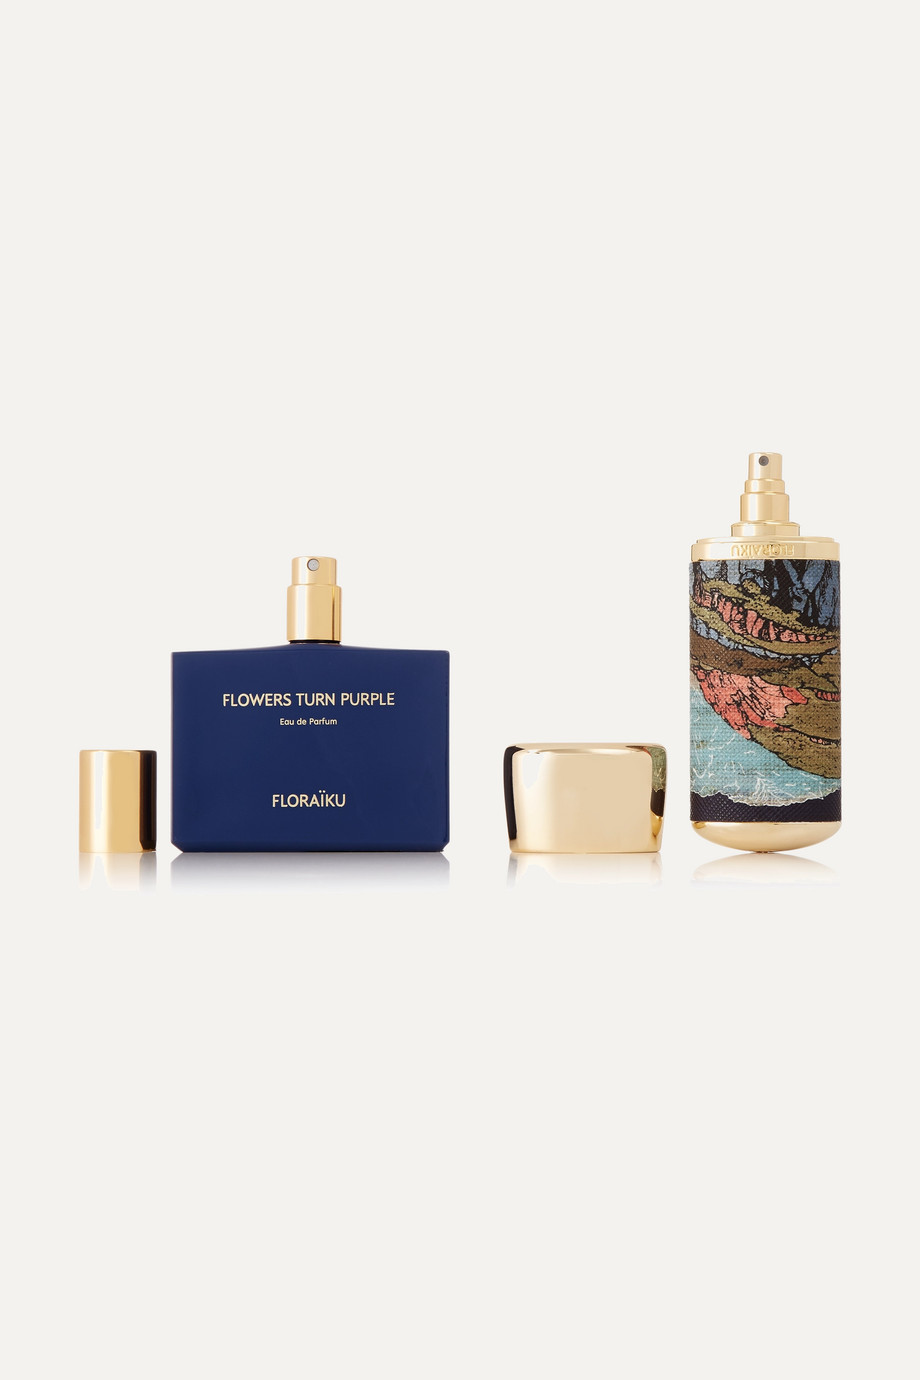 Floraiku Flowers Turn Purple, 50 ml & 10 ml – Eau de Parfum